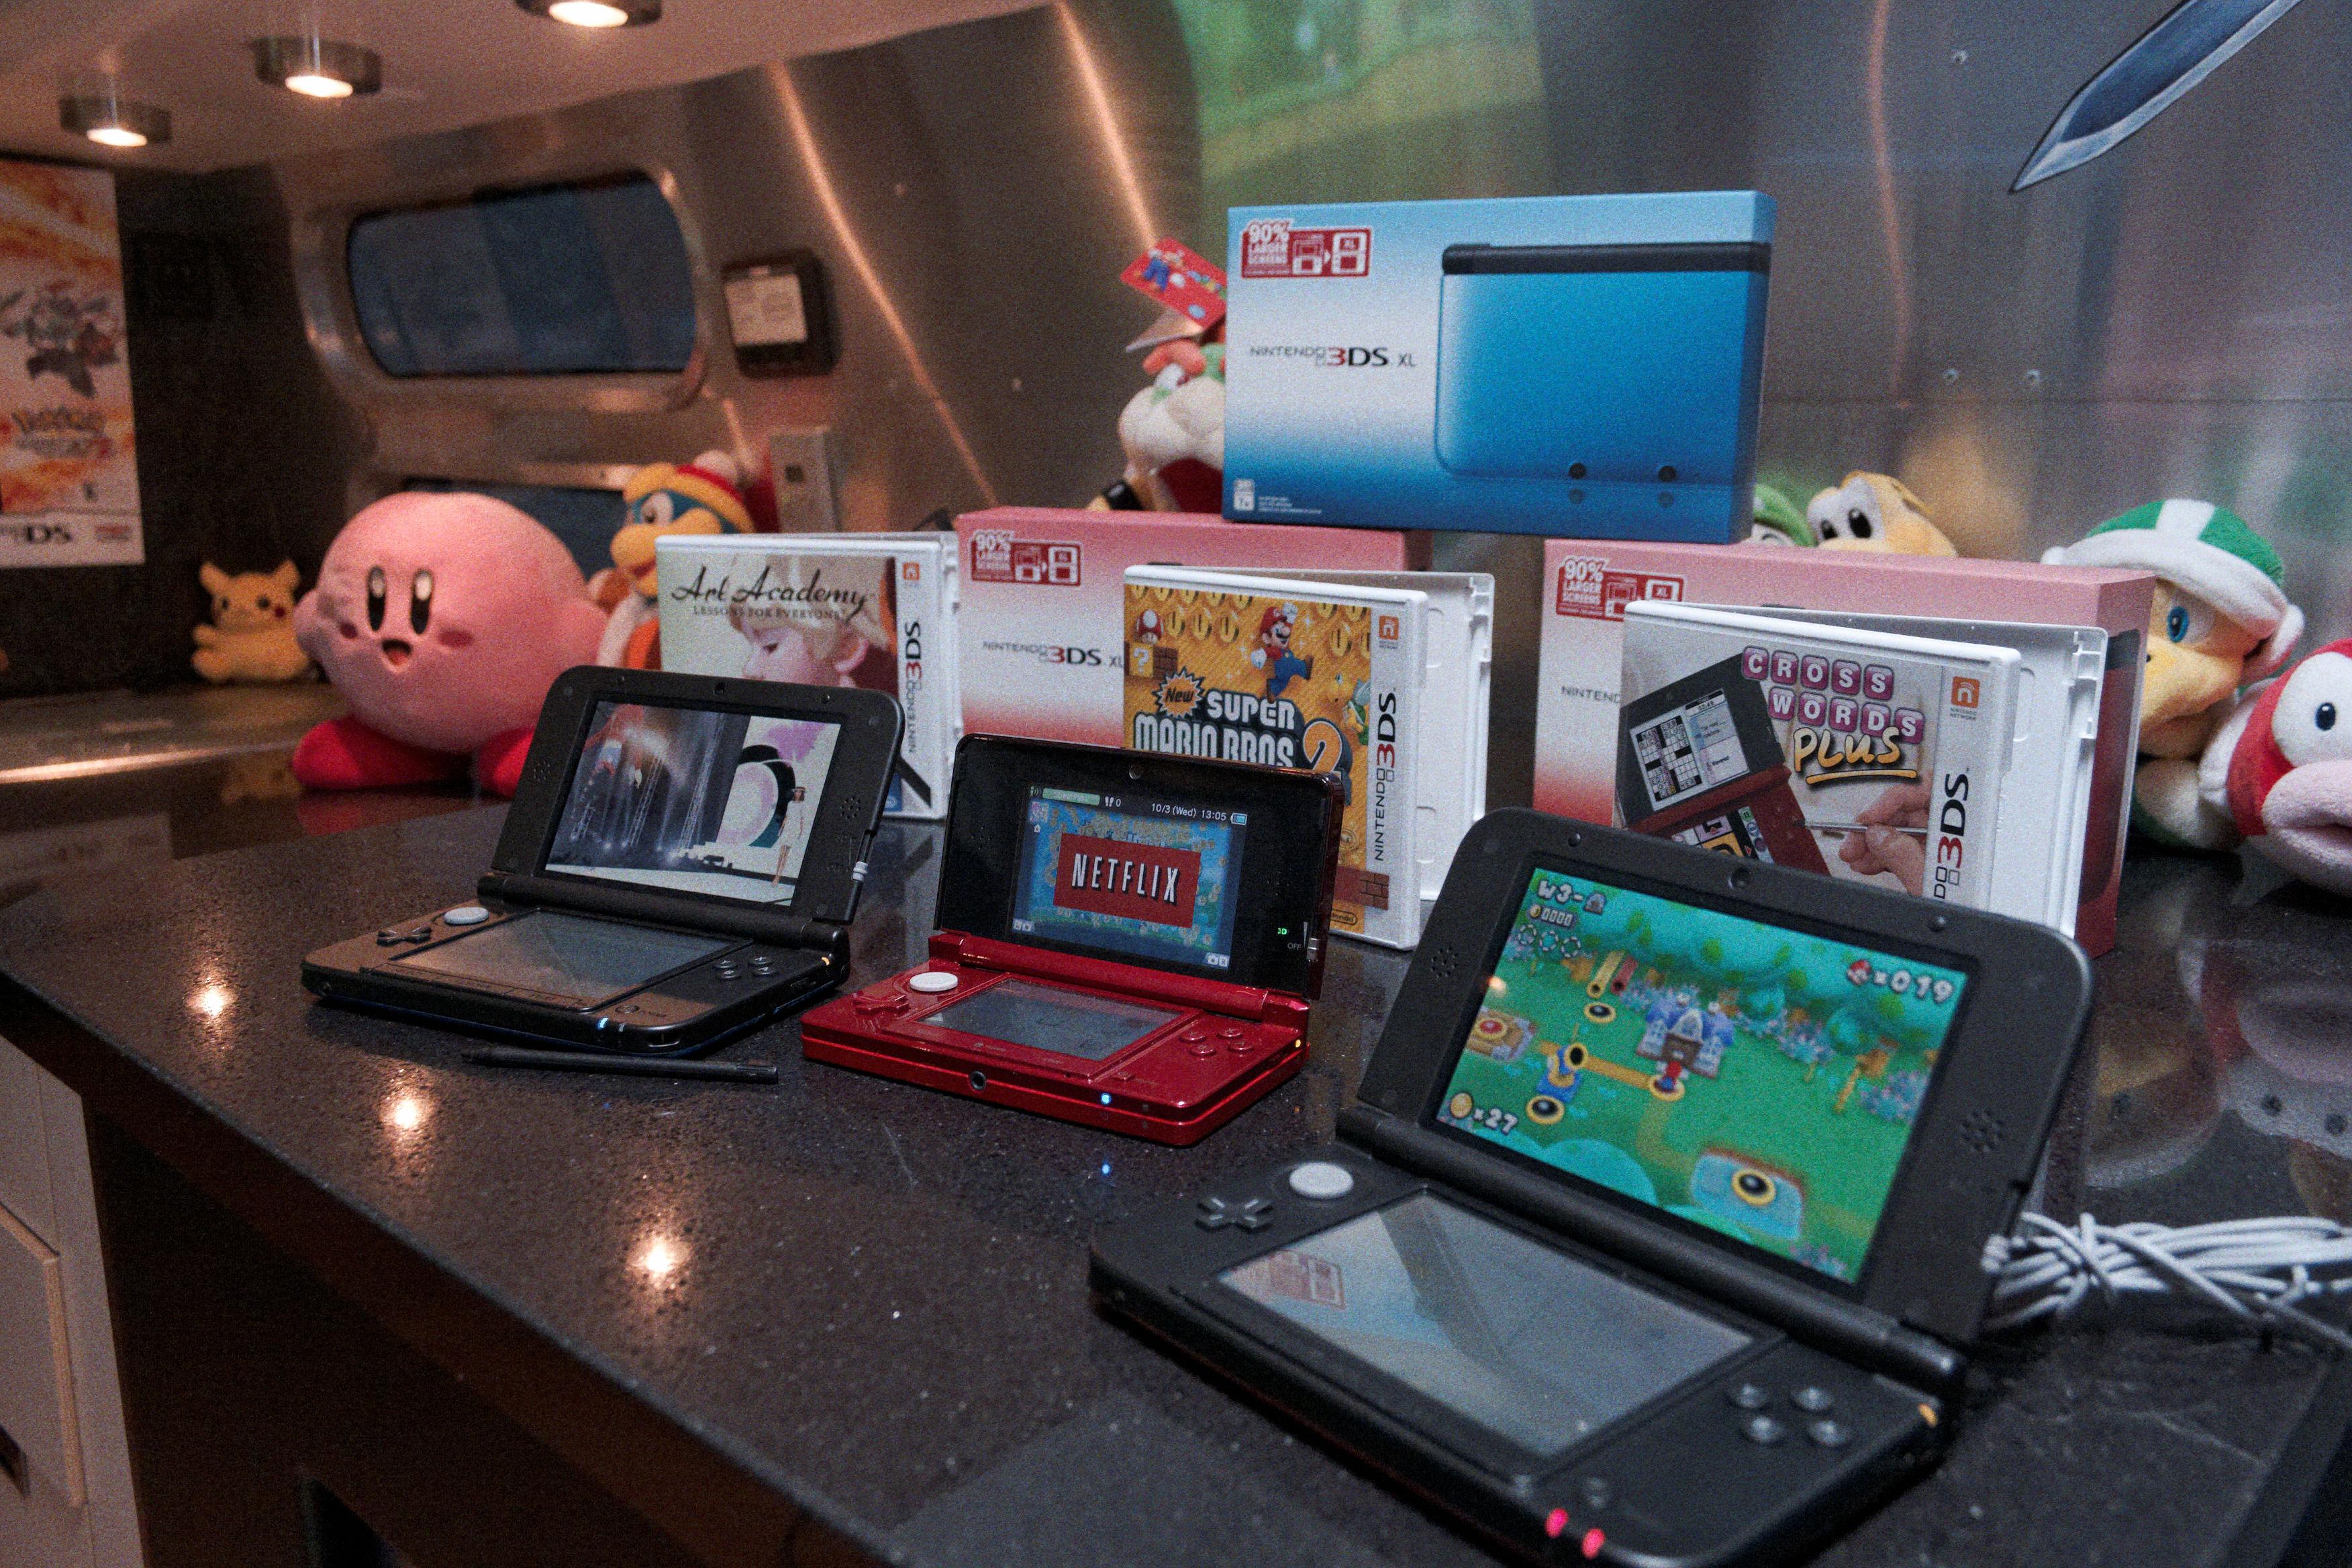 Wii U Nintendo Ds : Rumor nintendo is working on a new next gen console